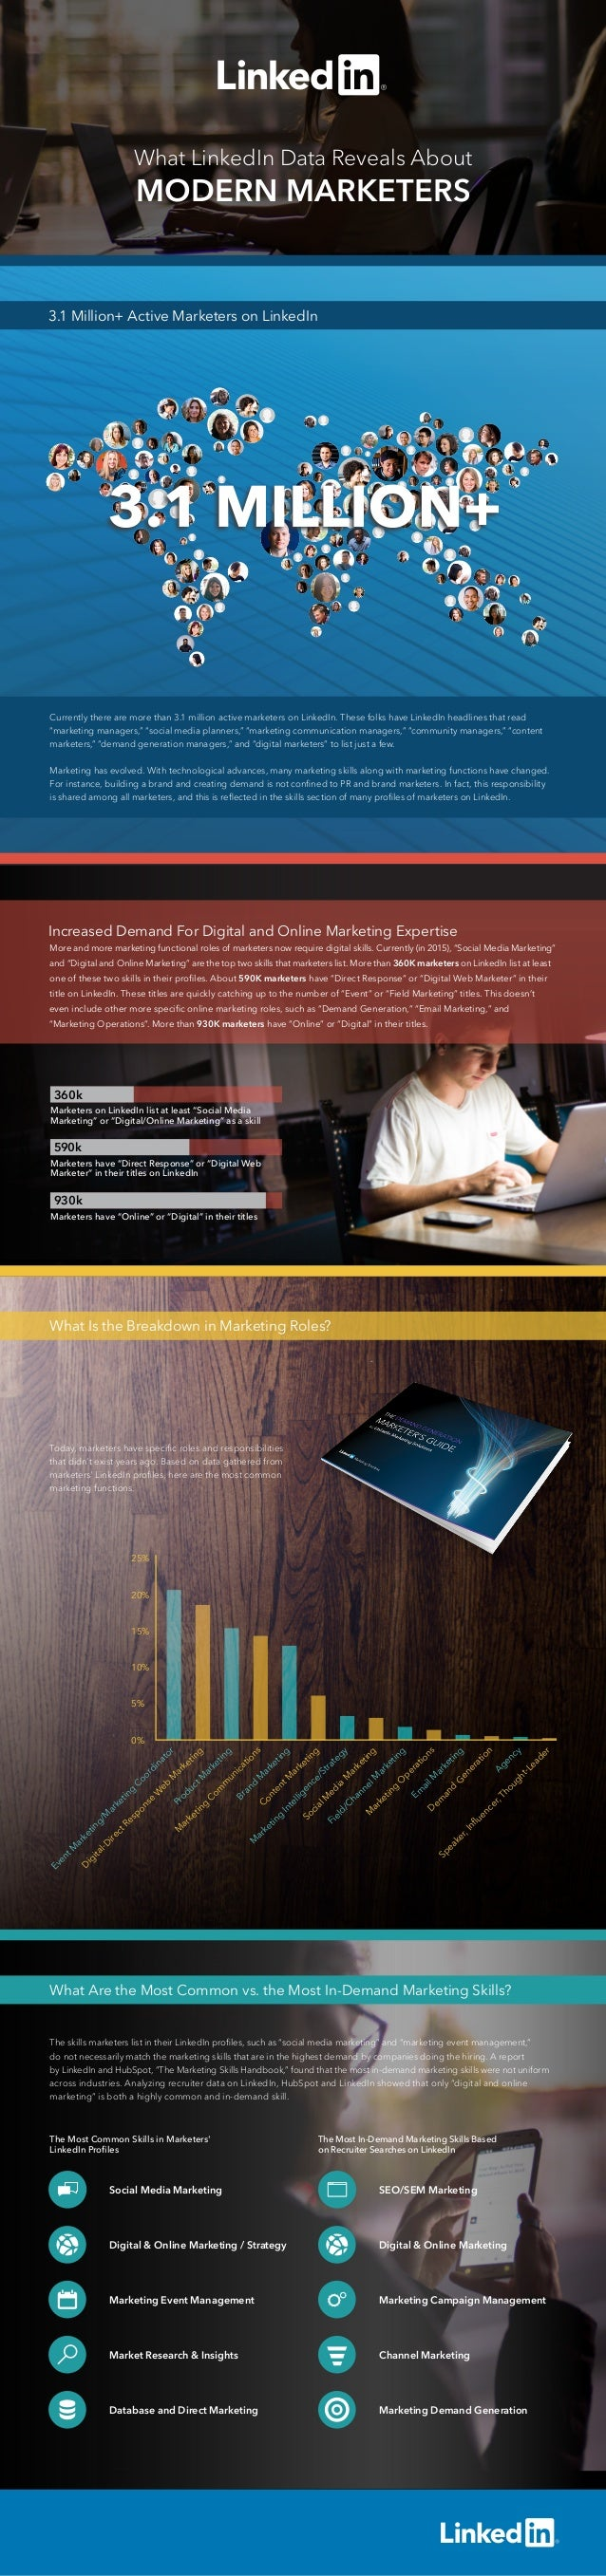 25% 20% 15% 10% 5% 0% EventM arketing/M arketing C oordinator D igital-D irectResponse W eb M arketing ProductM arketing M...